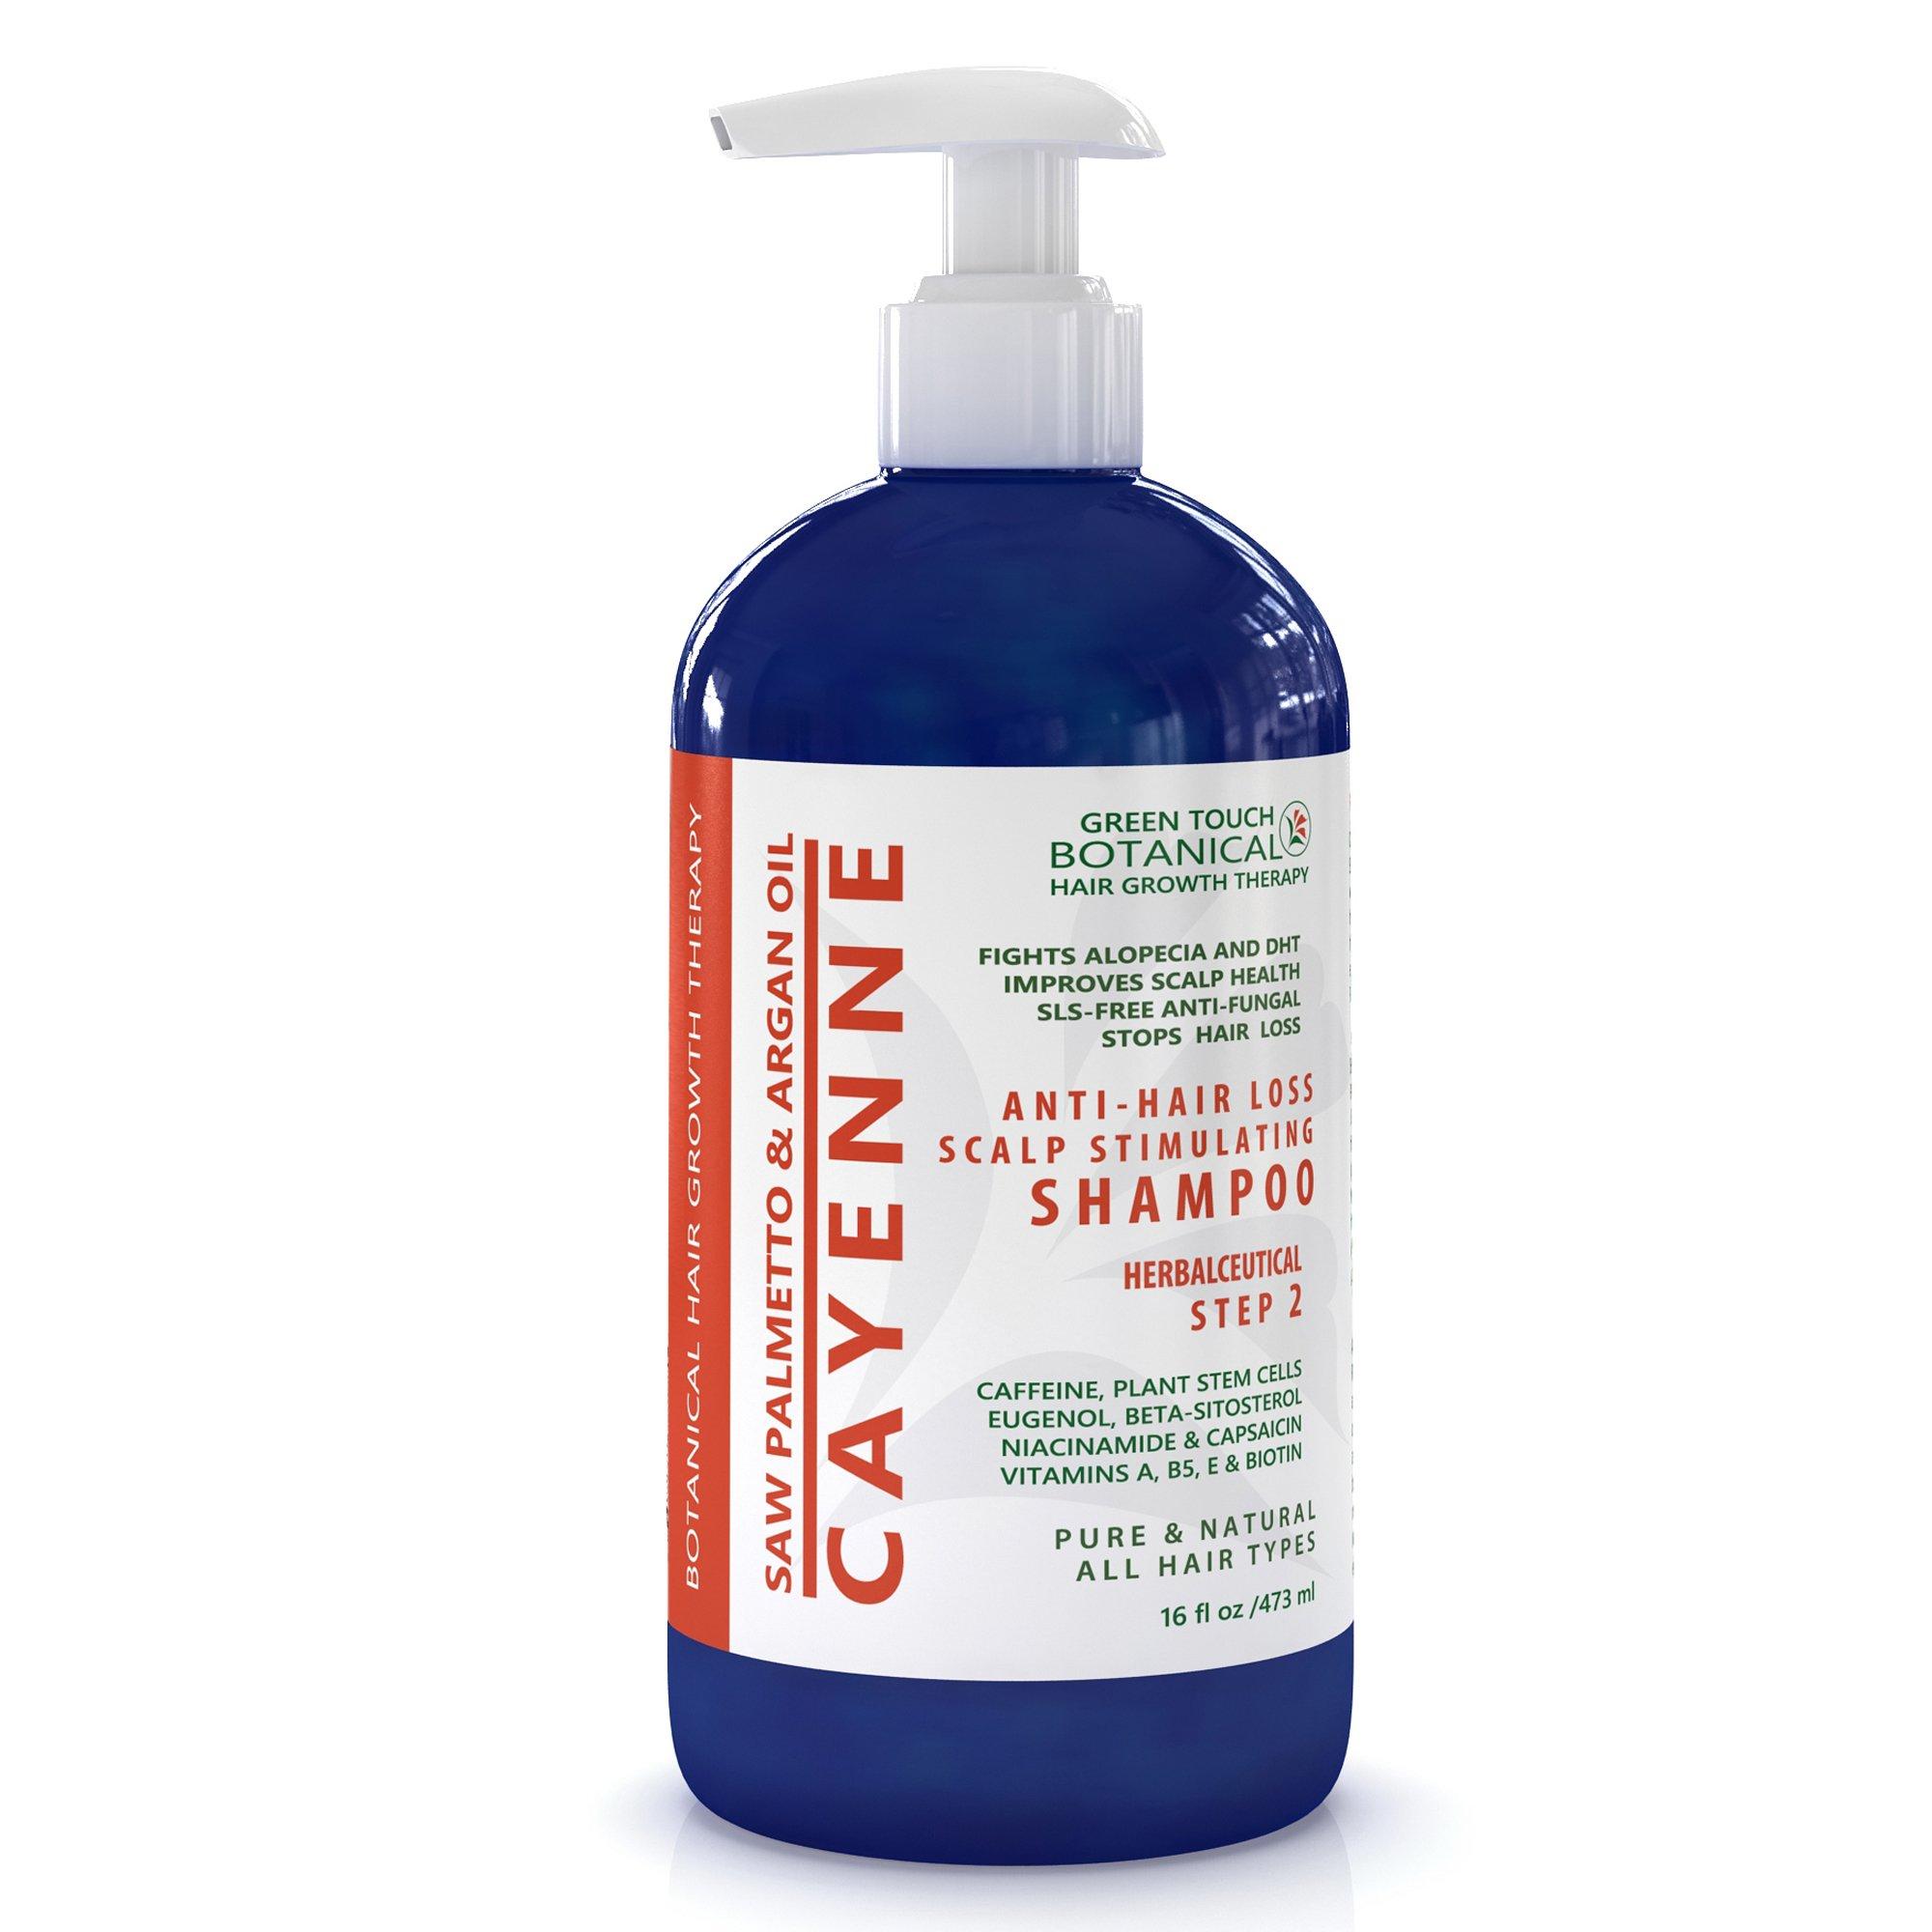 STEP 2 Organic Anti Hair Loss Shampoo Cayenne /Saw Palmetto & Argan Oil 16 Oz Green Touch Botanical Hair Growth Therapy …